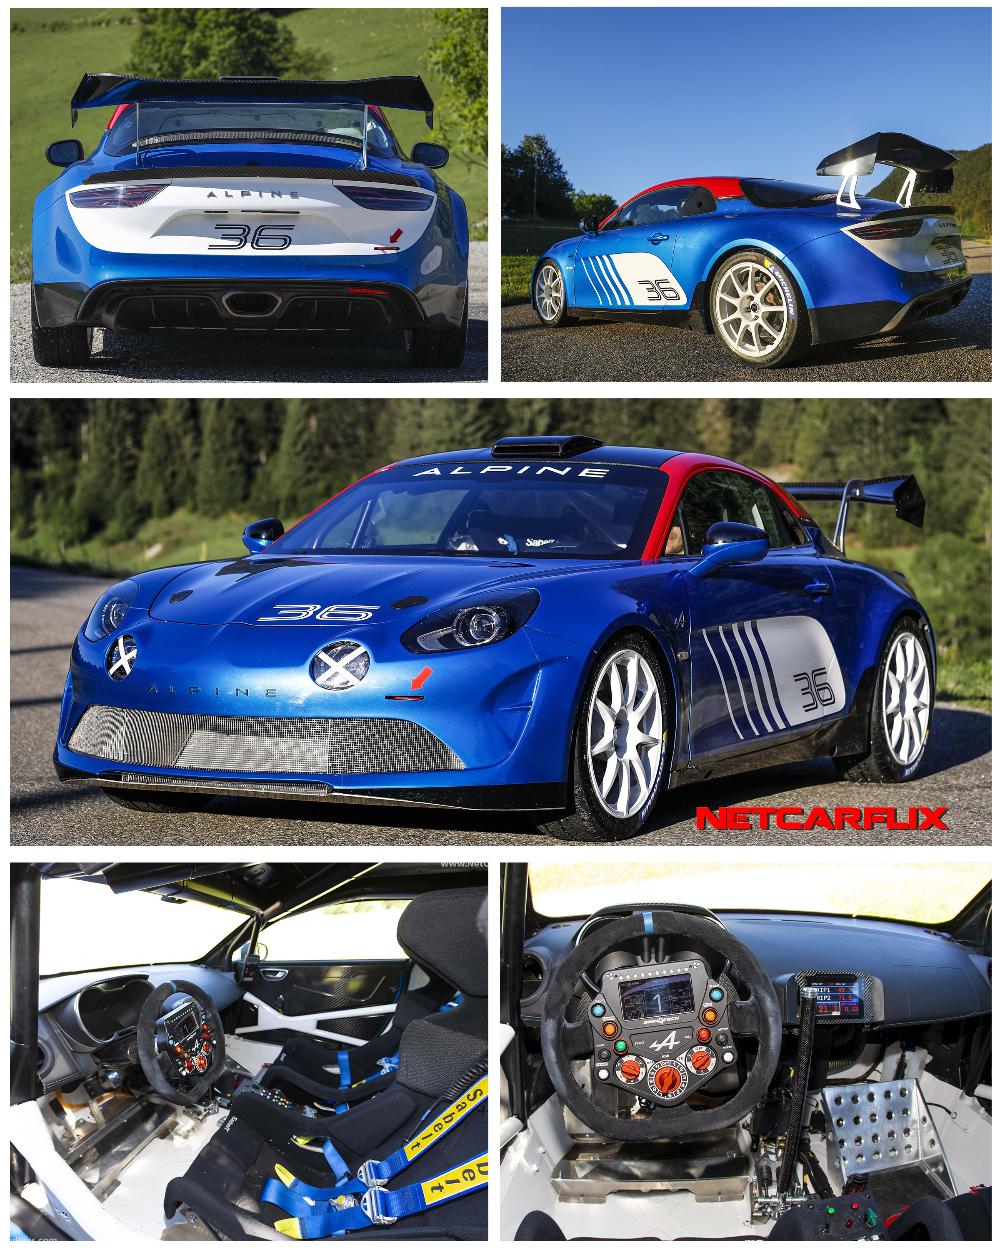 2020 Alpine A110 Rally Dailyrevs Com Reverse Gear Alpine Roll Cage